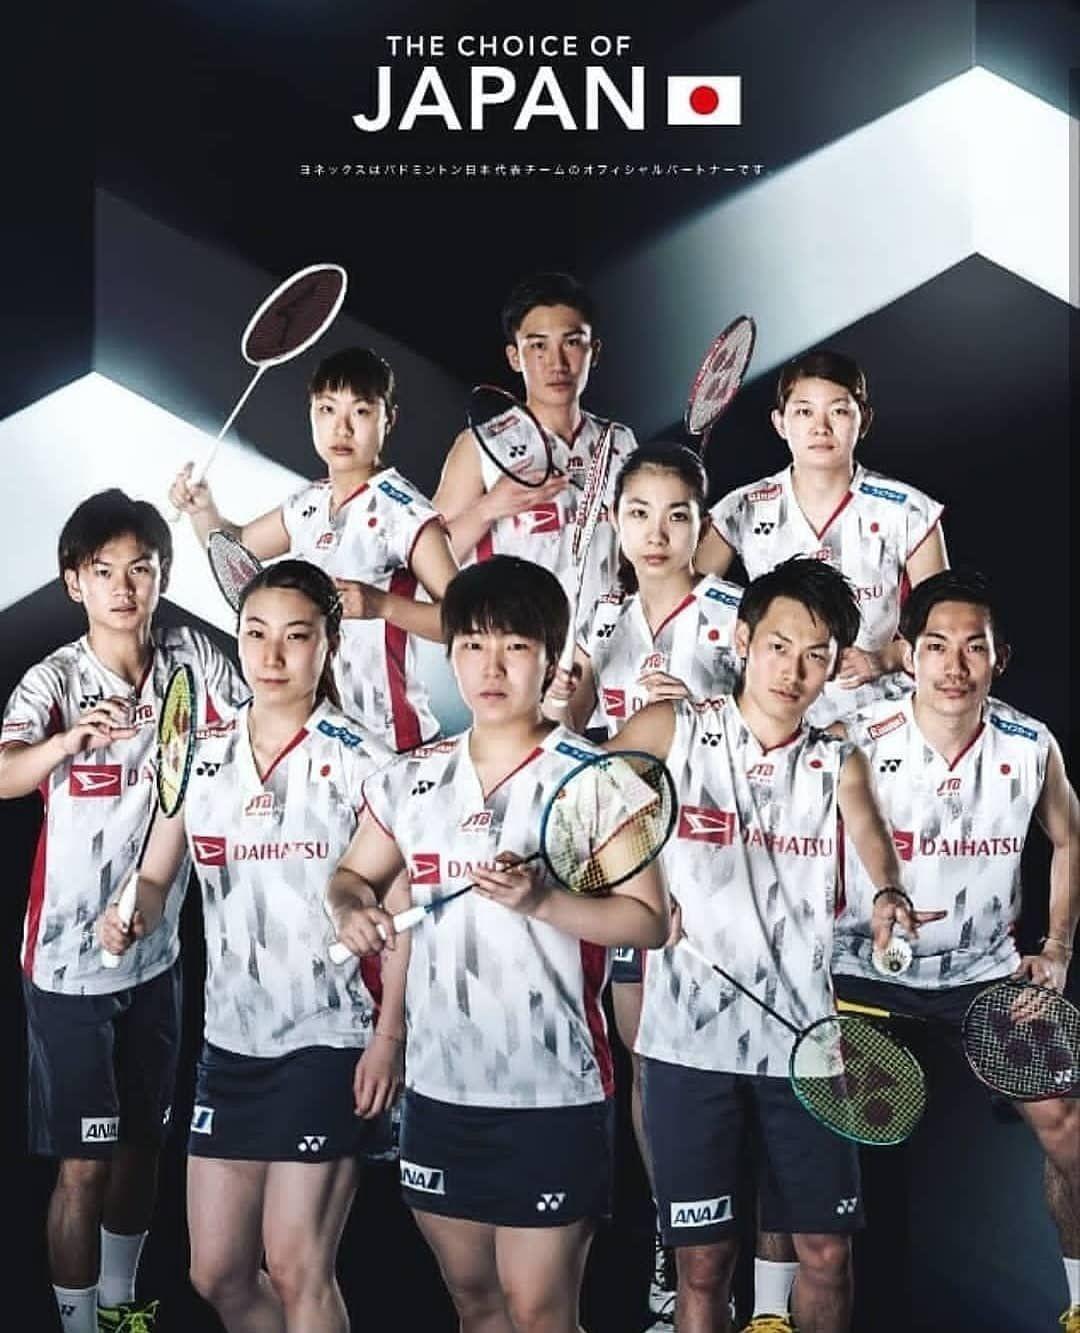 Japan Badminton Team Fanpage On Instagram Japan S Official Player List For Sudiman Cup 2019 1 Ms Kento Momota Kenta Nishimo In 2020 Badminton Team Badminton Teams